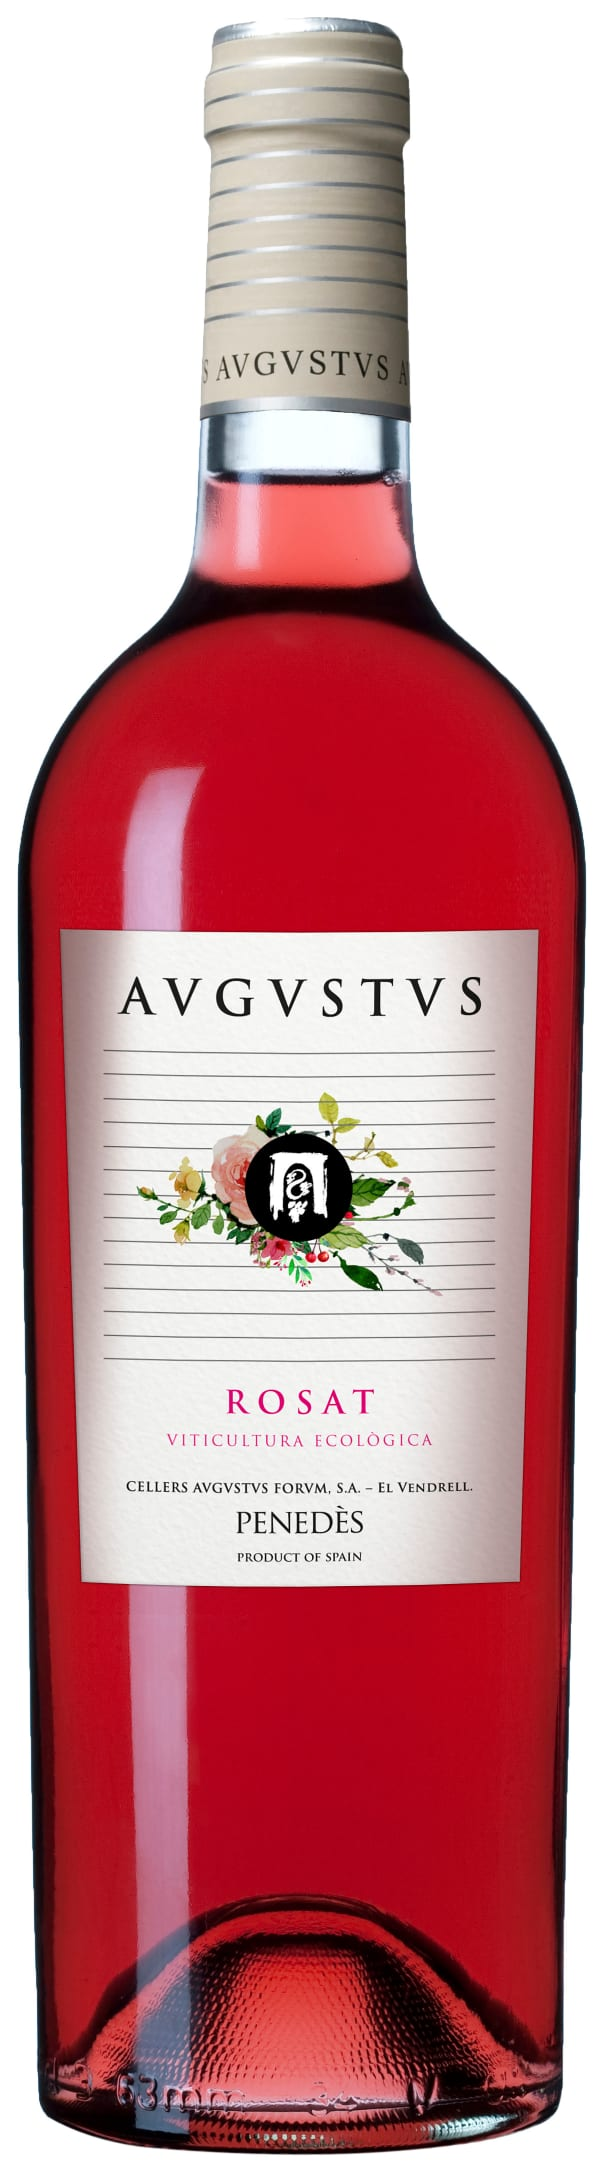 Avgvstvs Rosat Viticultura Ecológica 2017